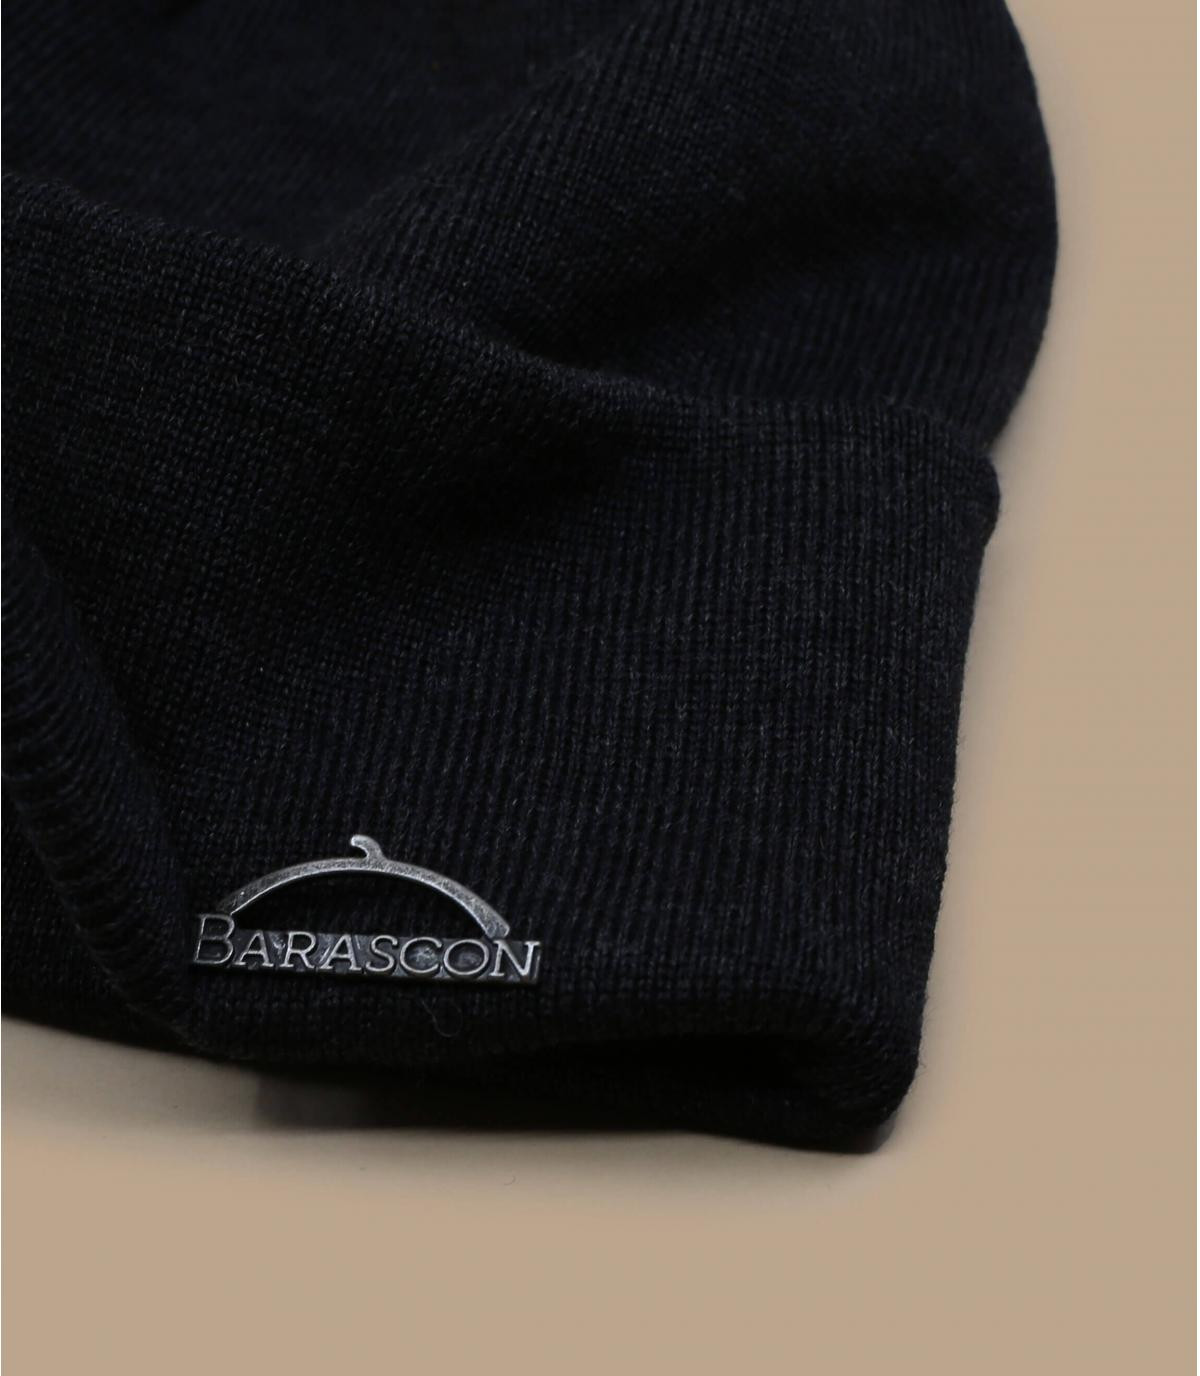 Detalles Barascon Beanie Wool Acryl dark grey imagen 2